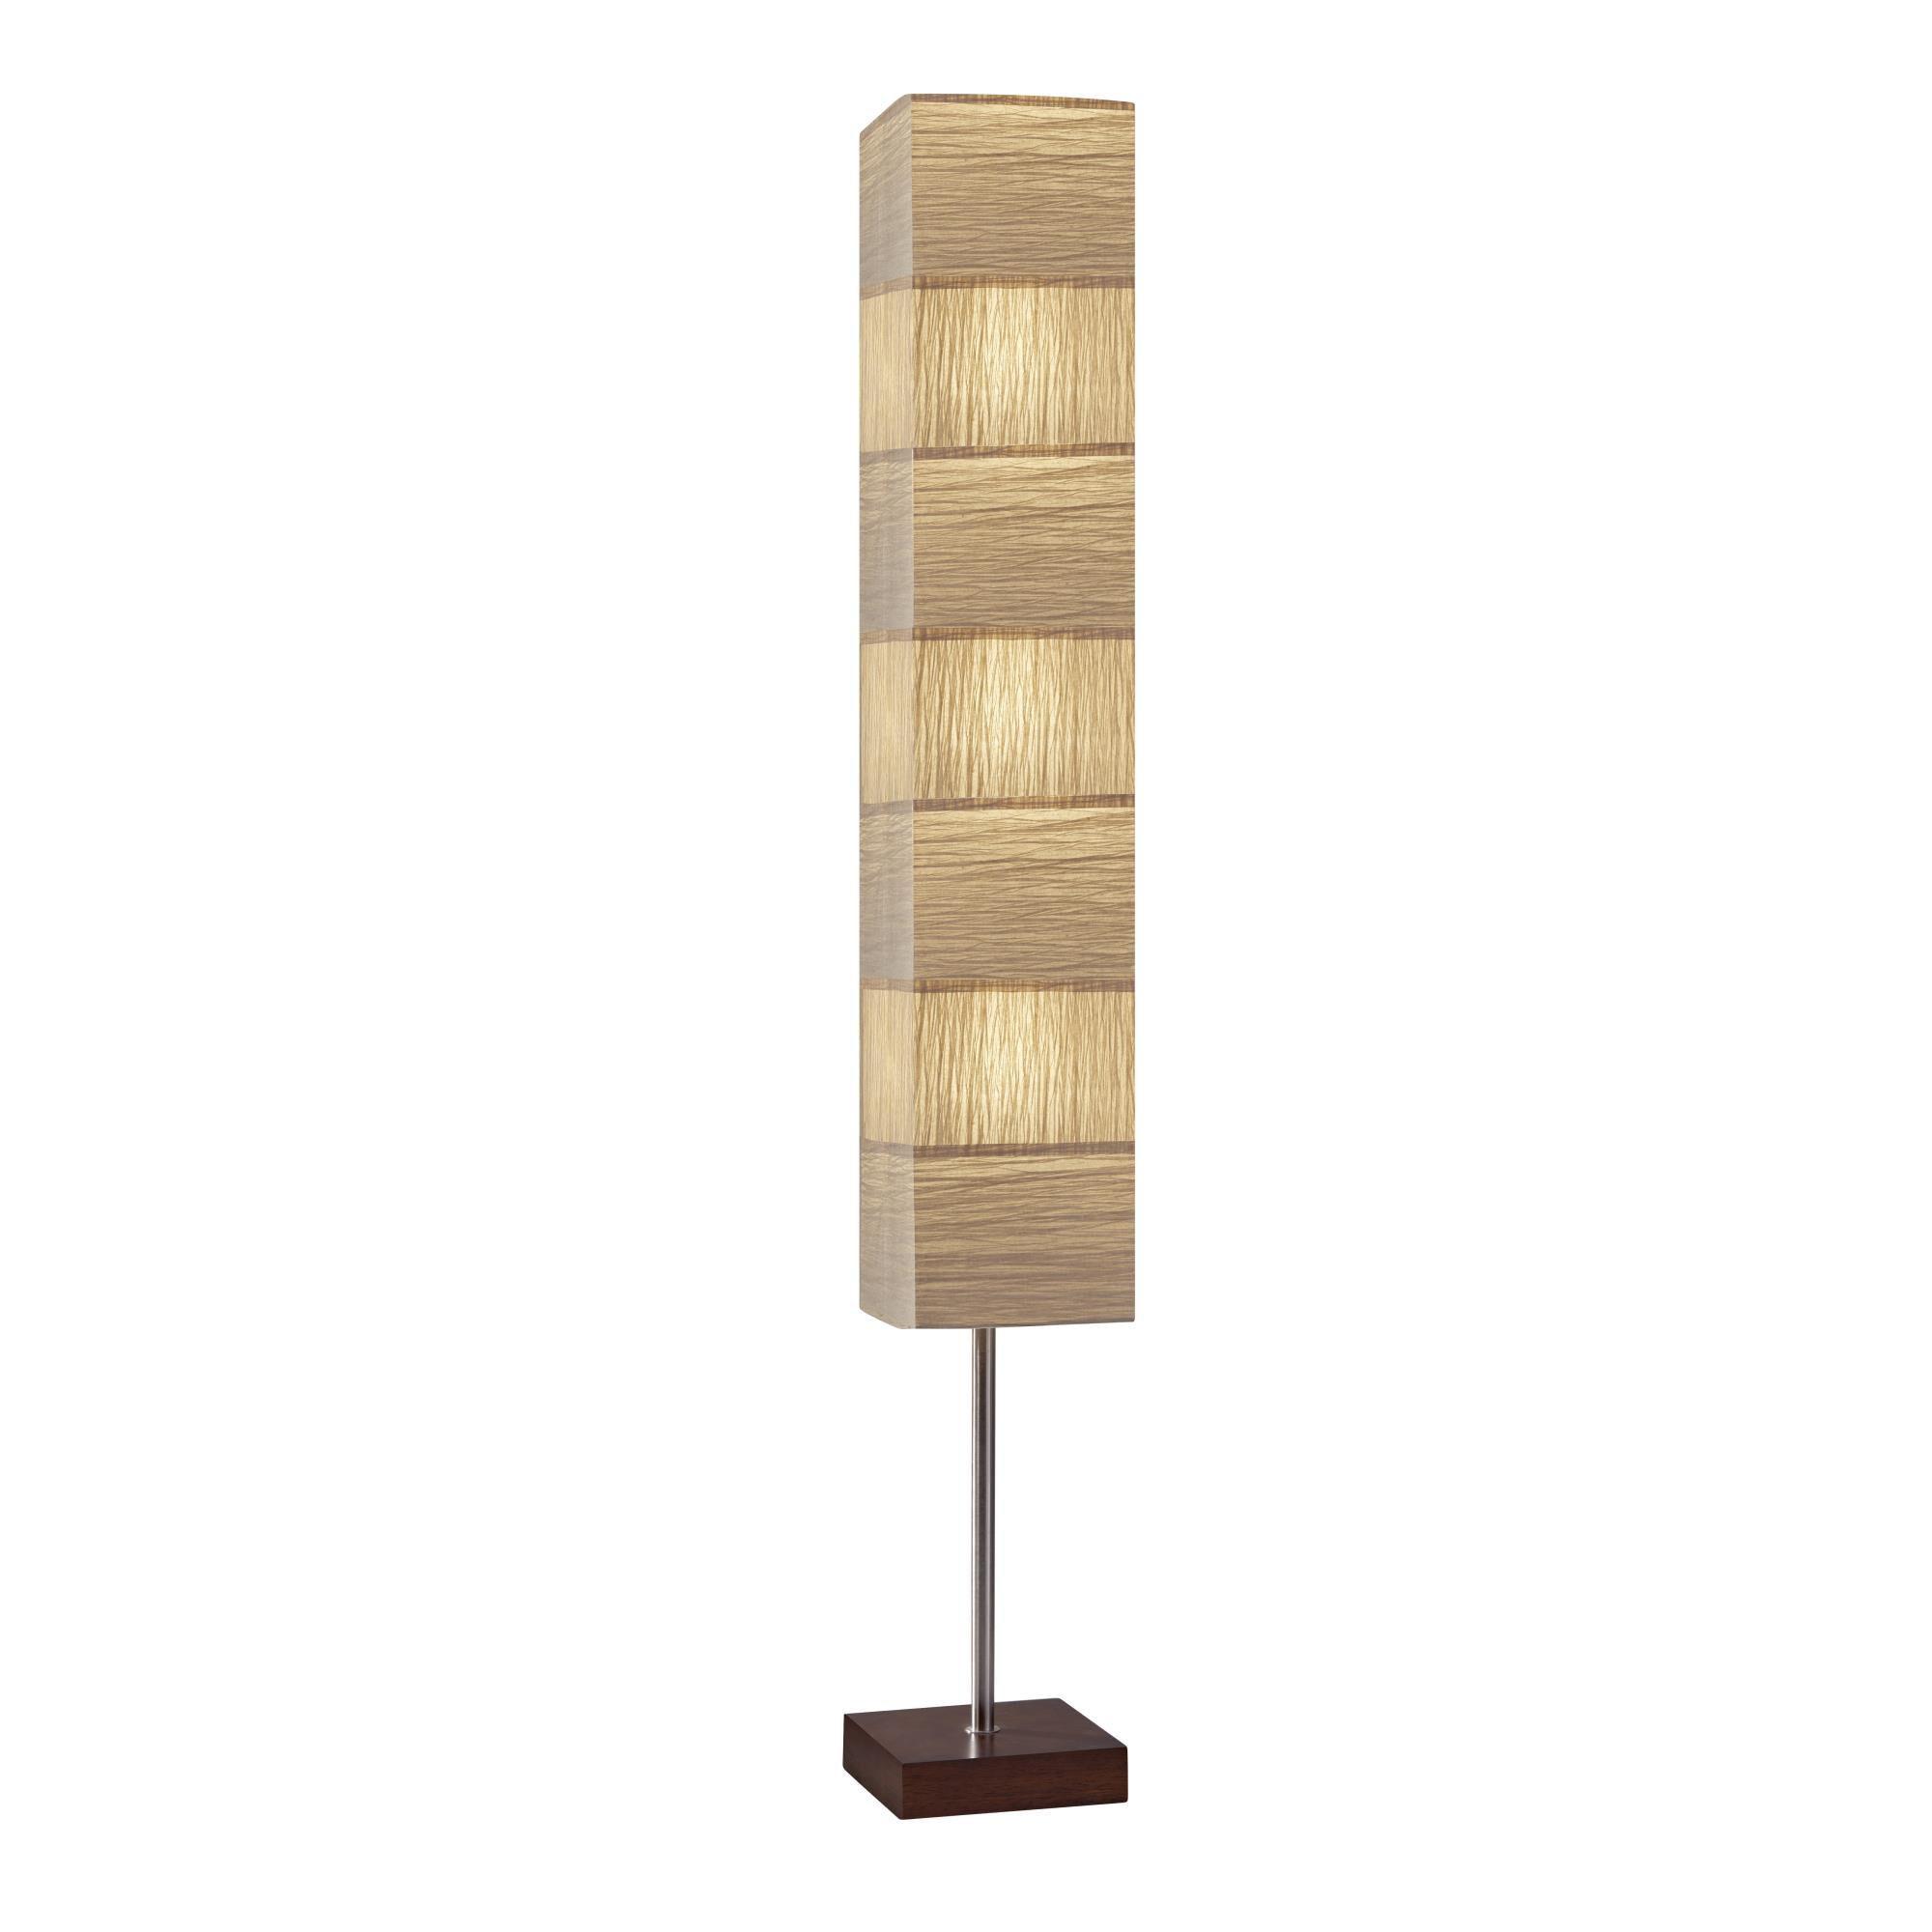 Sahara 72 Inch Floor Lamp Capitol Lighting Steel Floor Lamps Column Floor Lamp Steel Lamp